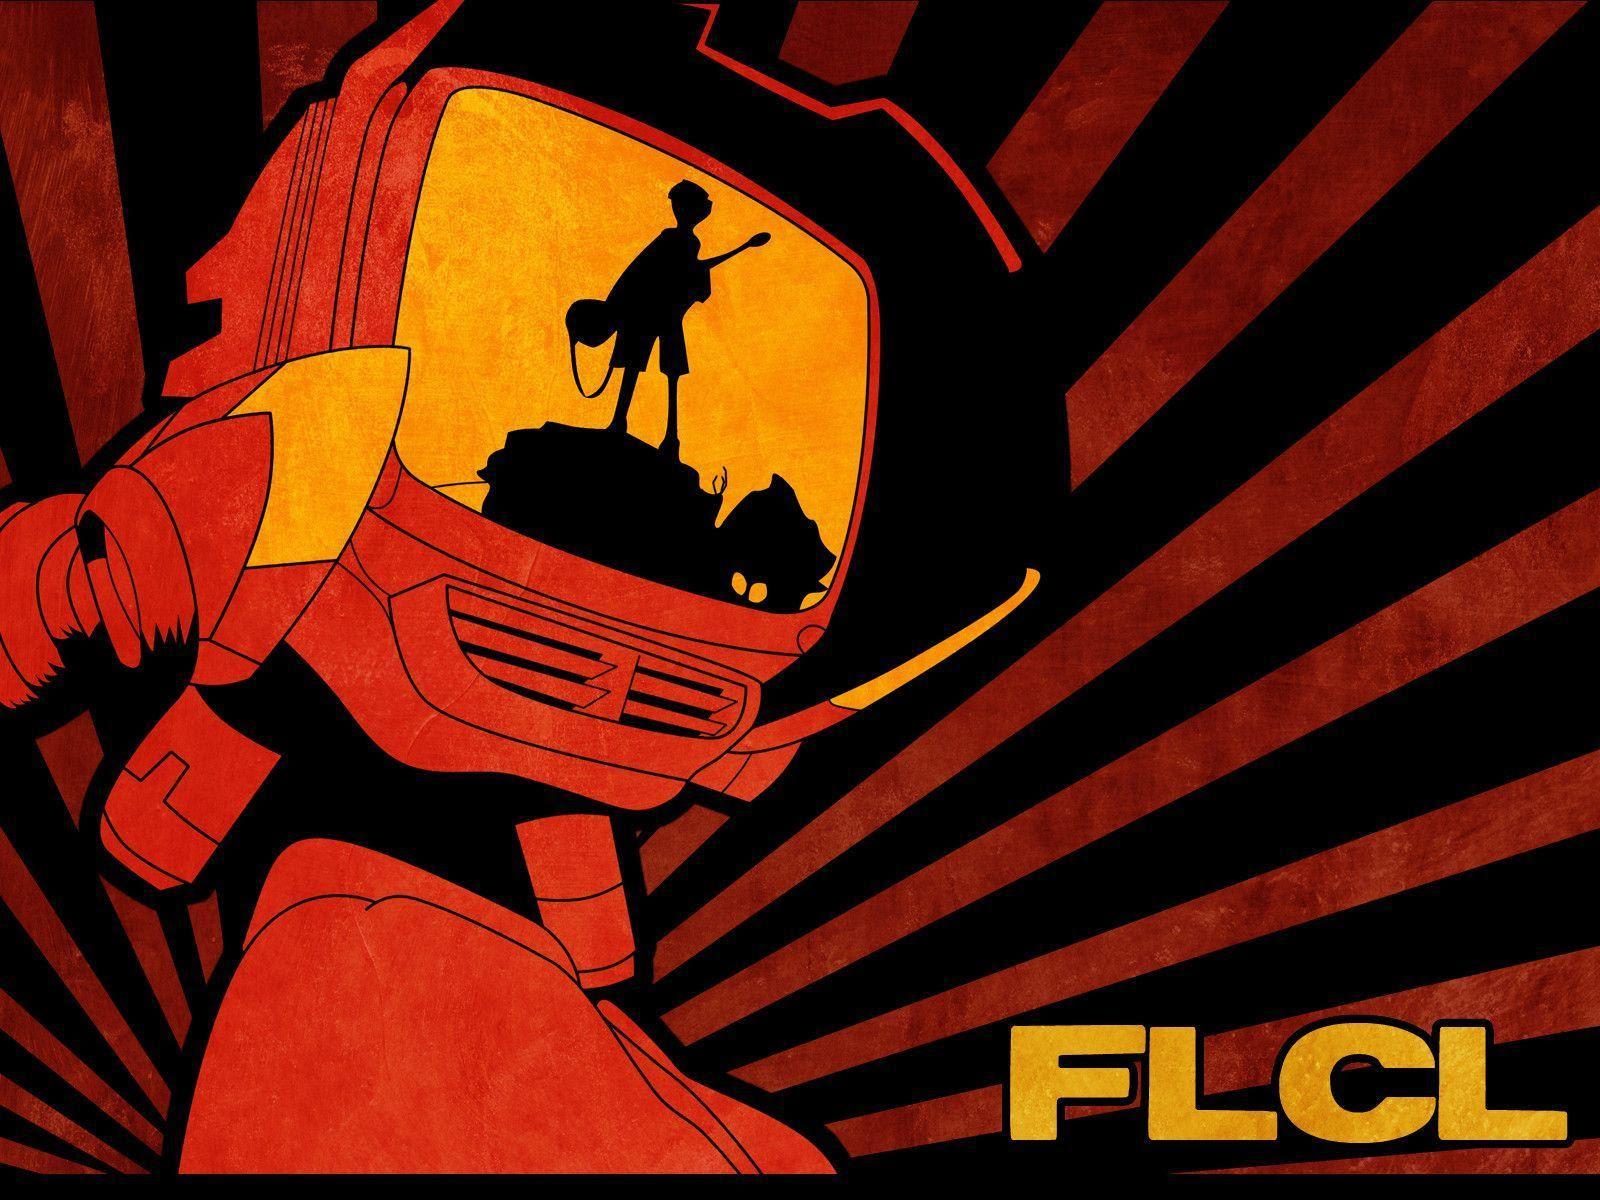 FLCL Wallpapers - Wallpaper Cave